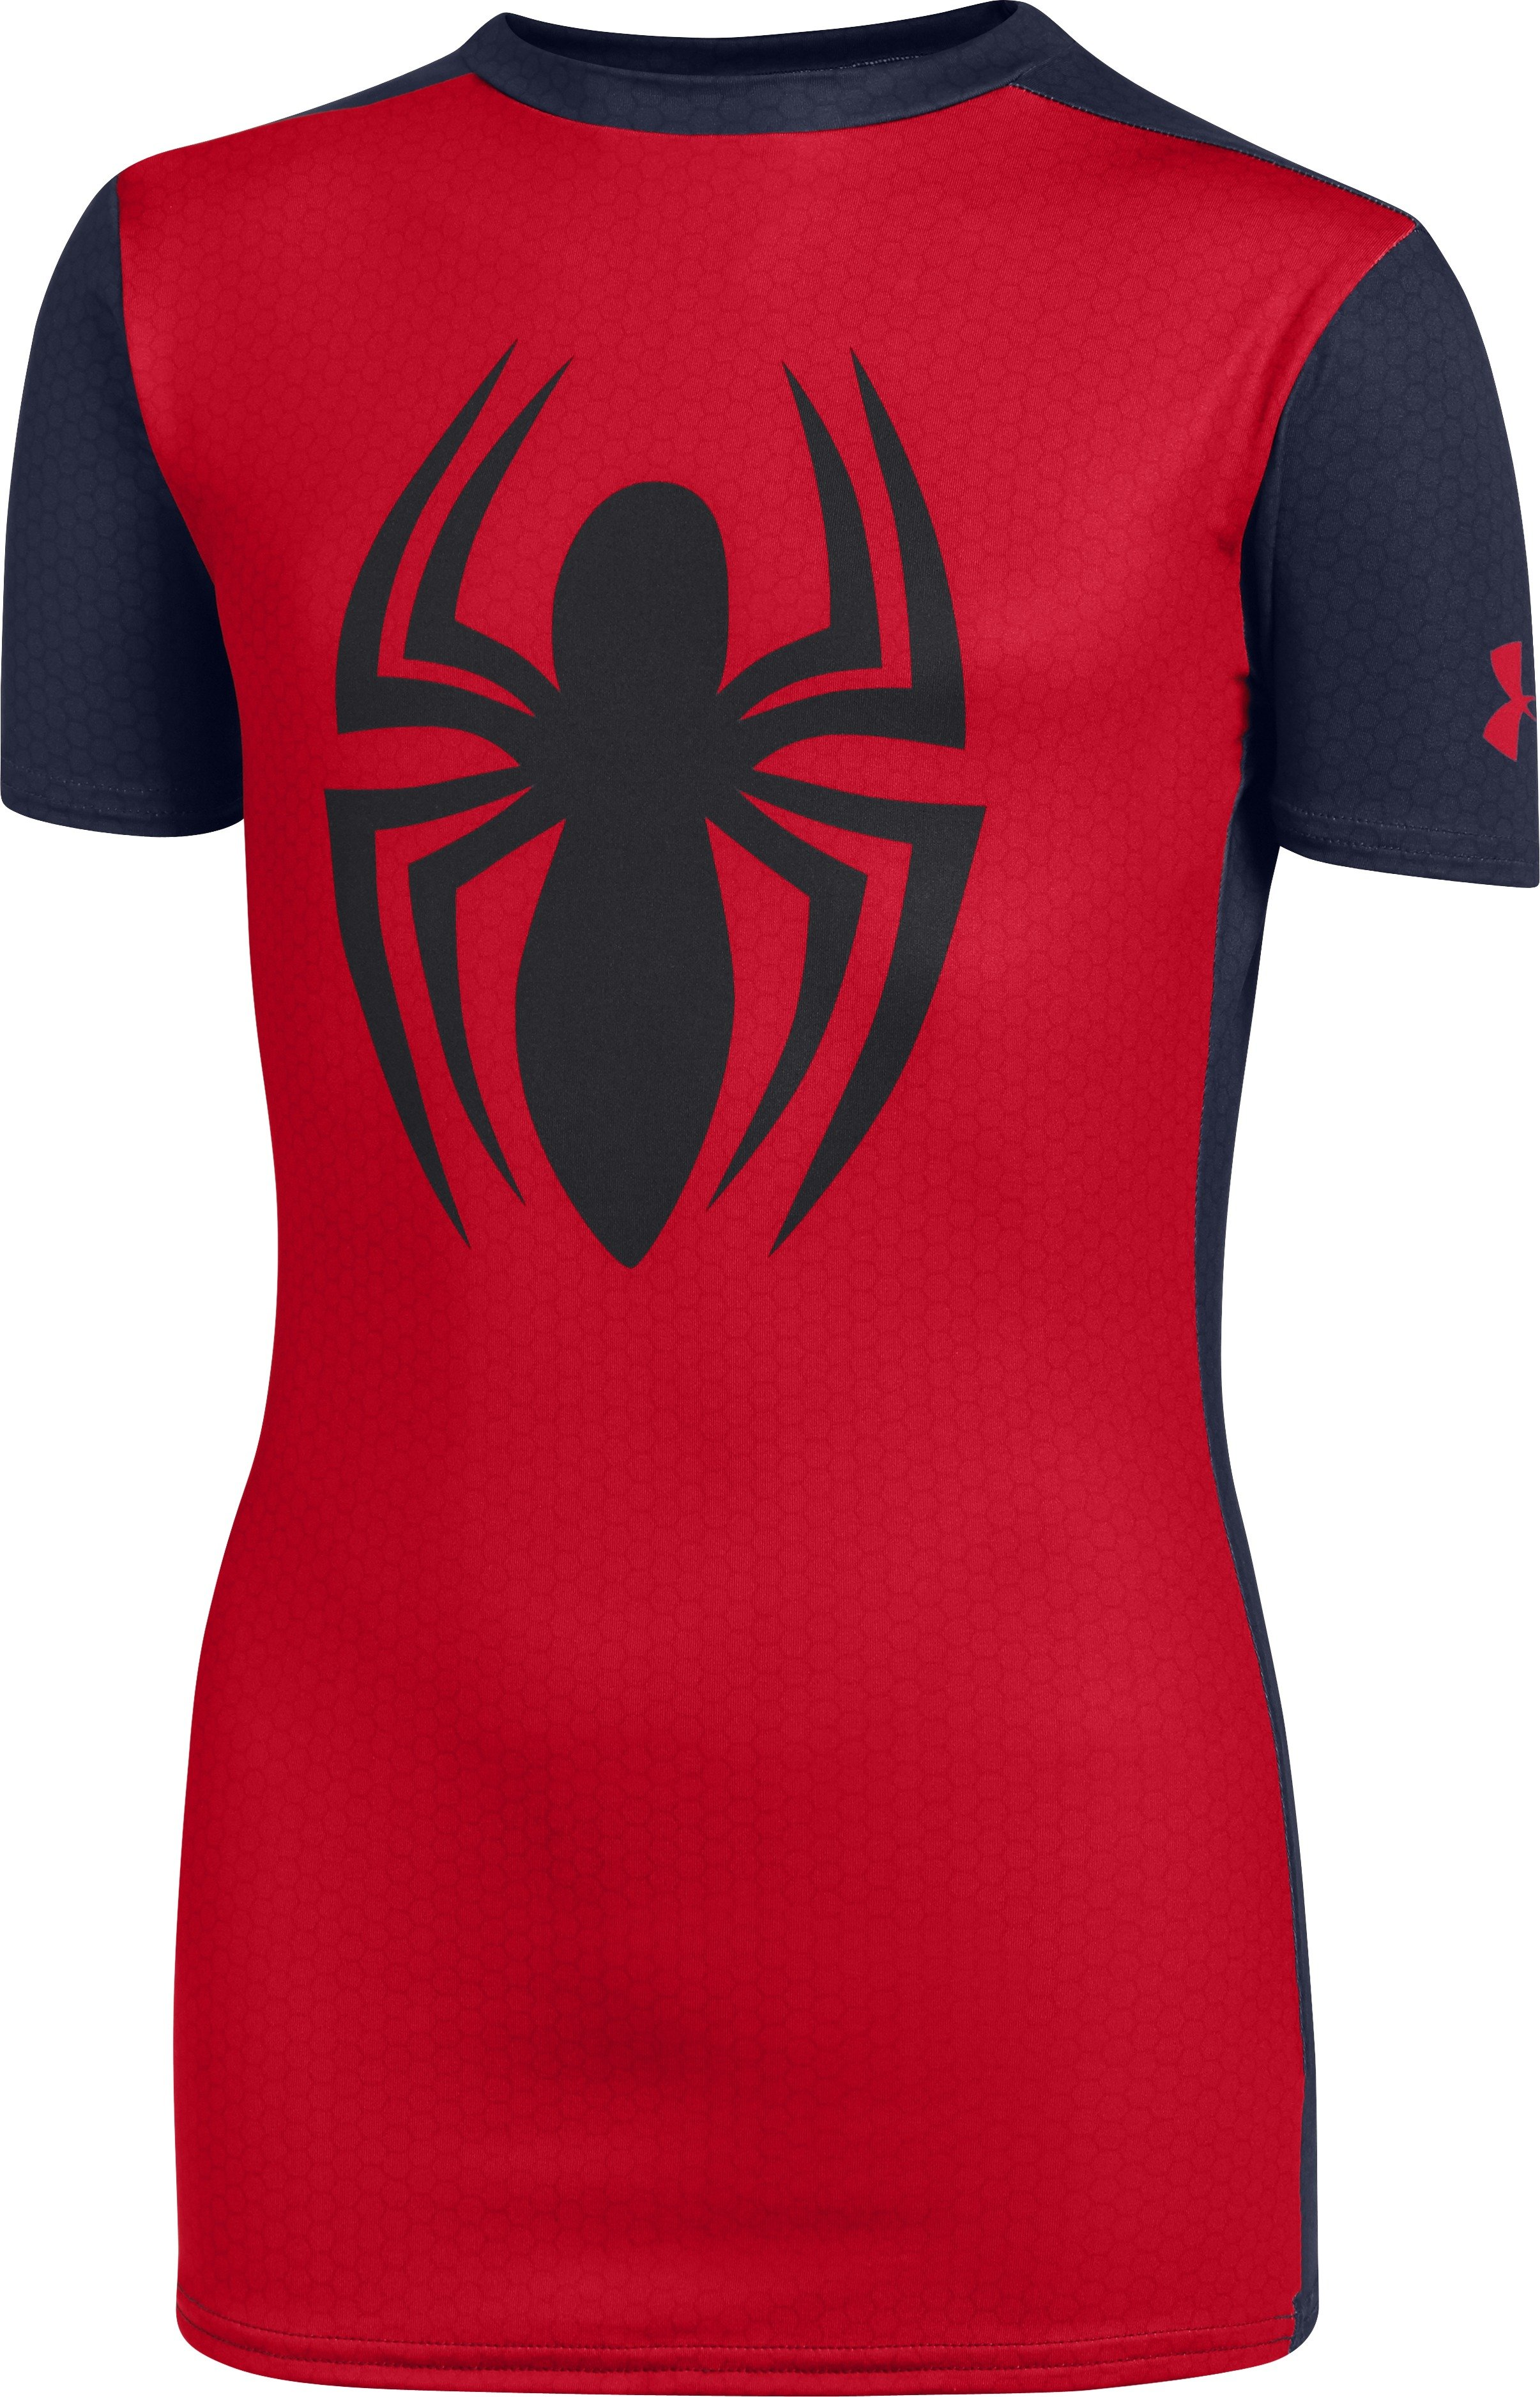 Under Armour Tee-shirt Compression Alter Ego Spiderman Junior v�tement running homme